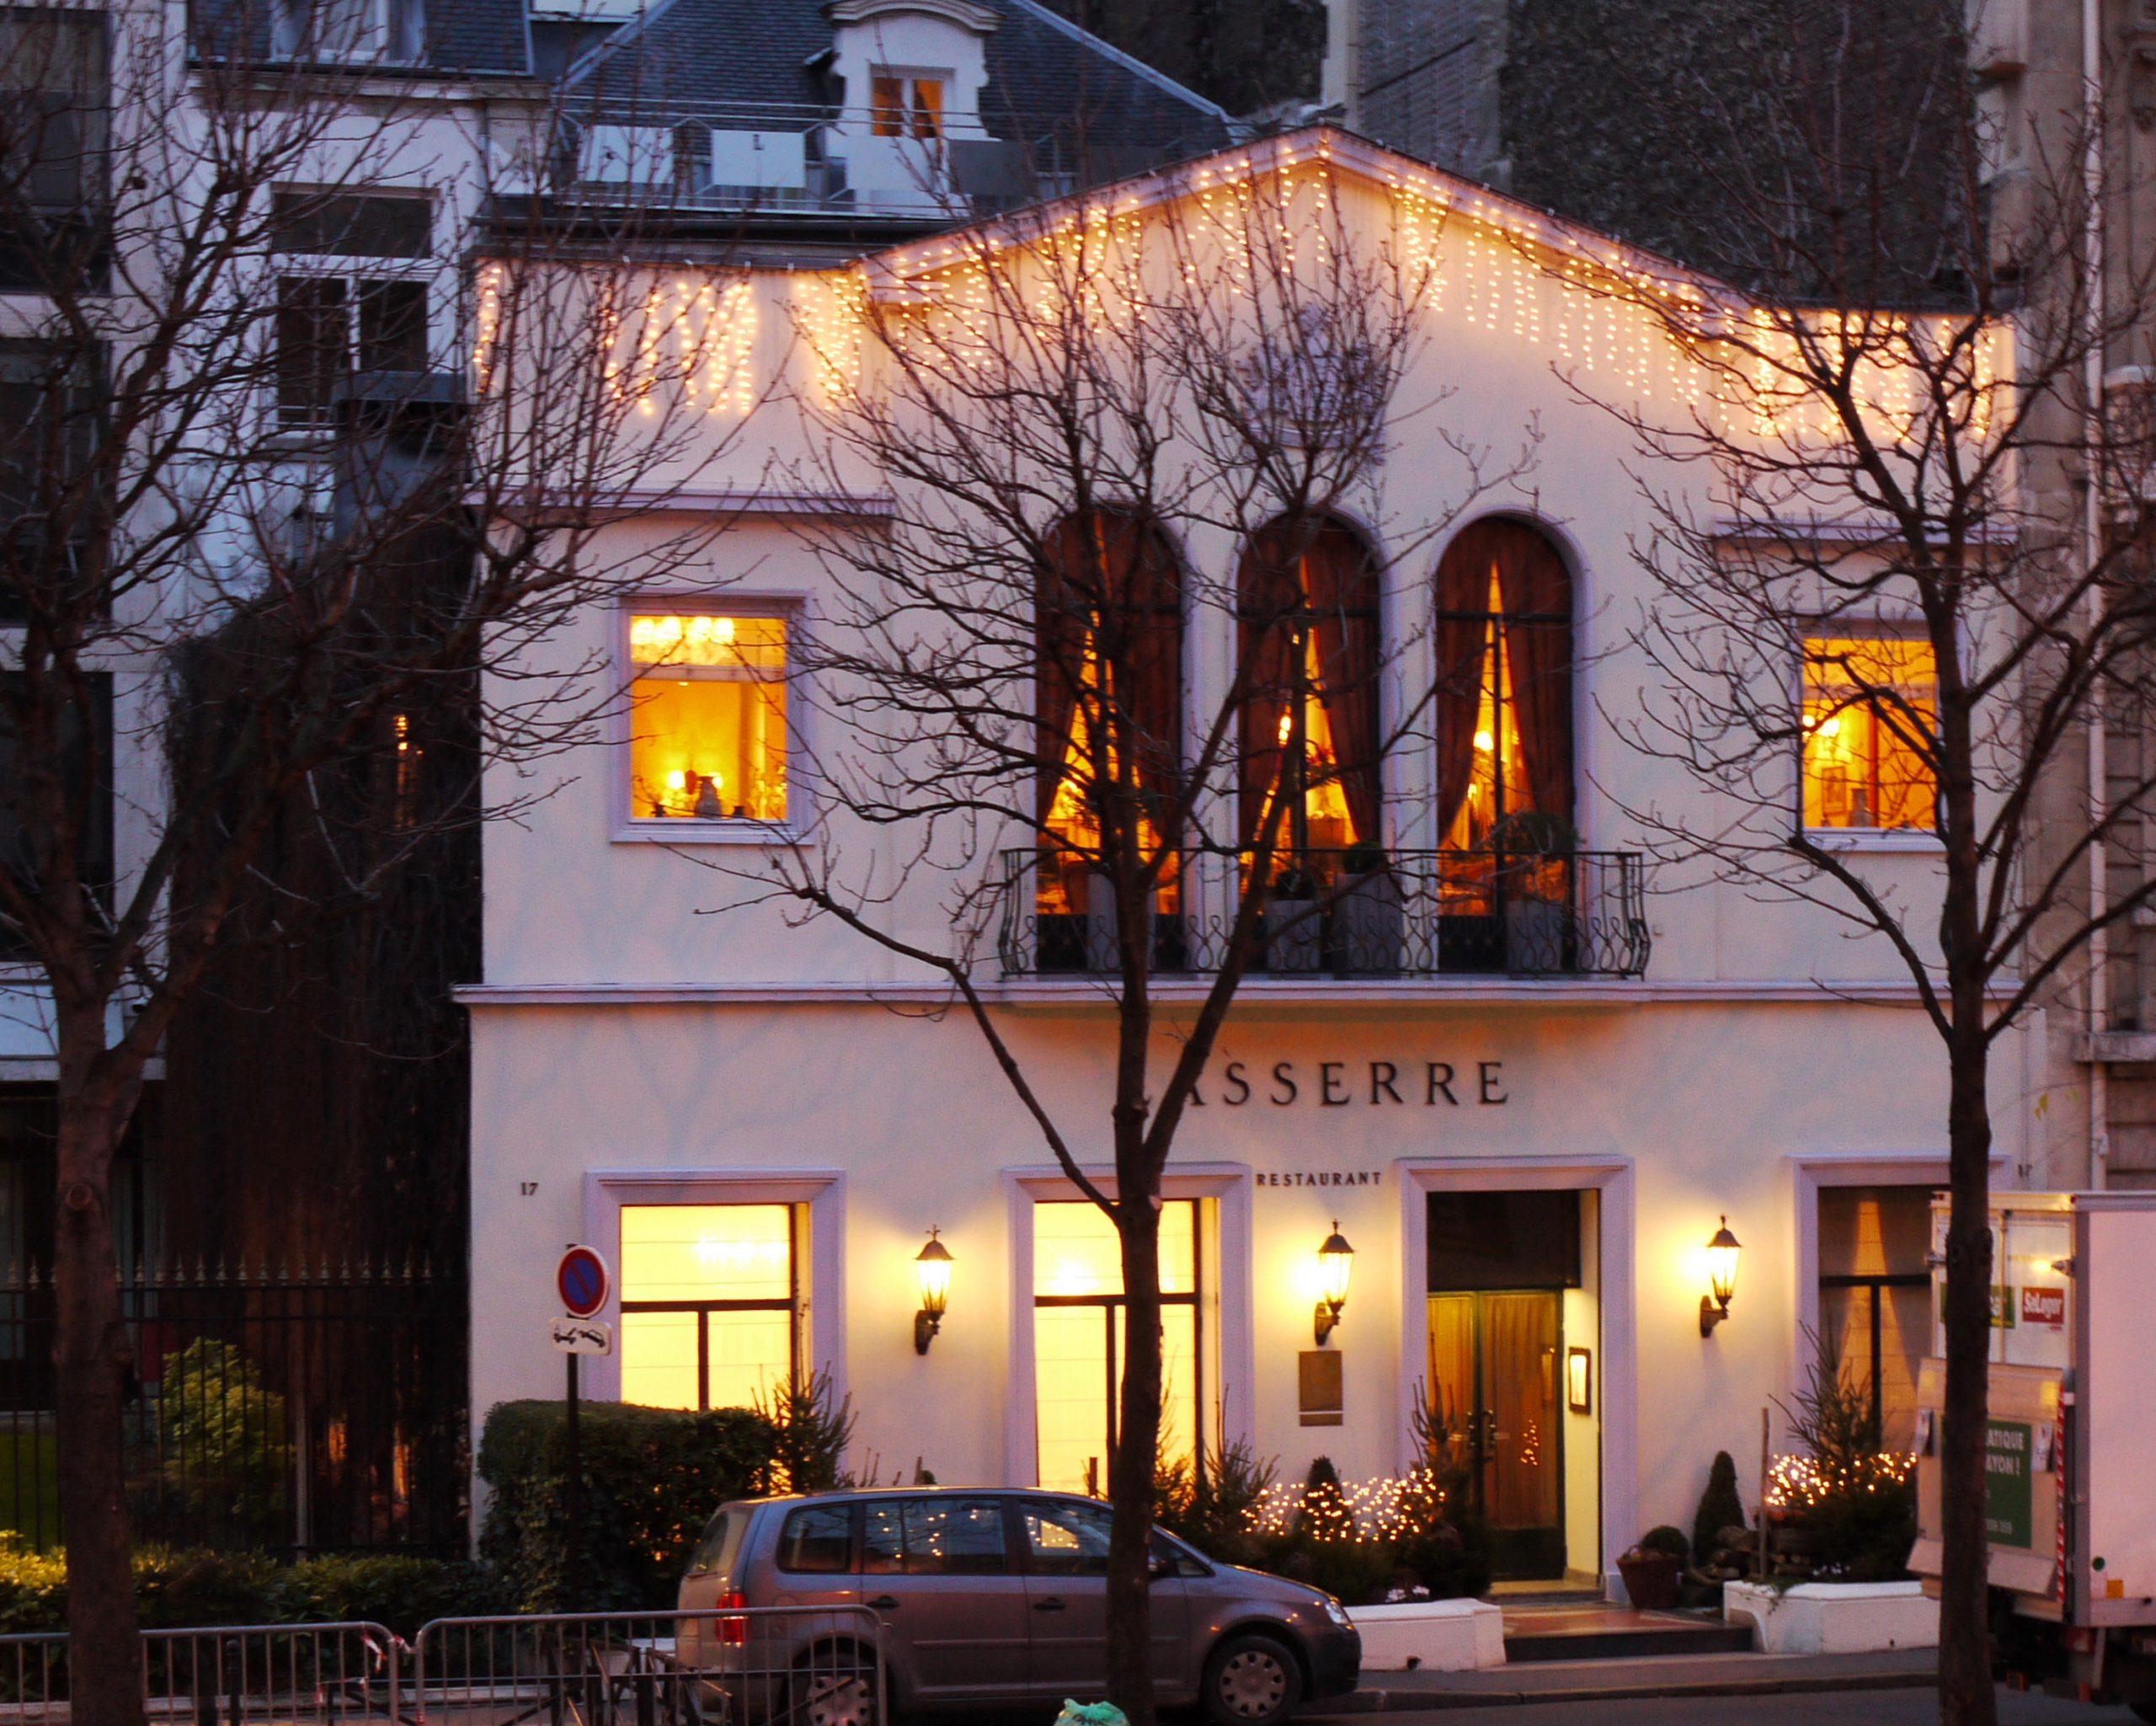 Lasserre (Restaurant) — Wikipédia dedans Restaurant Avec Jardin Ile De France